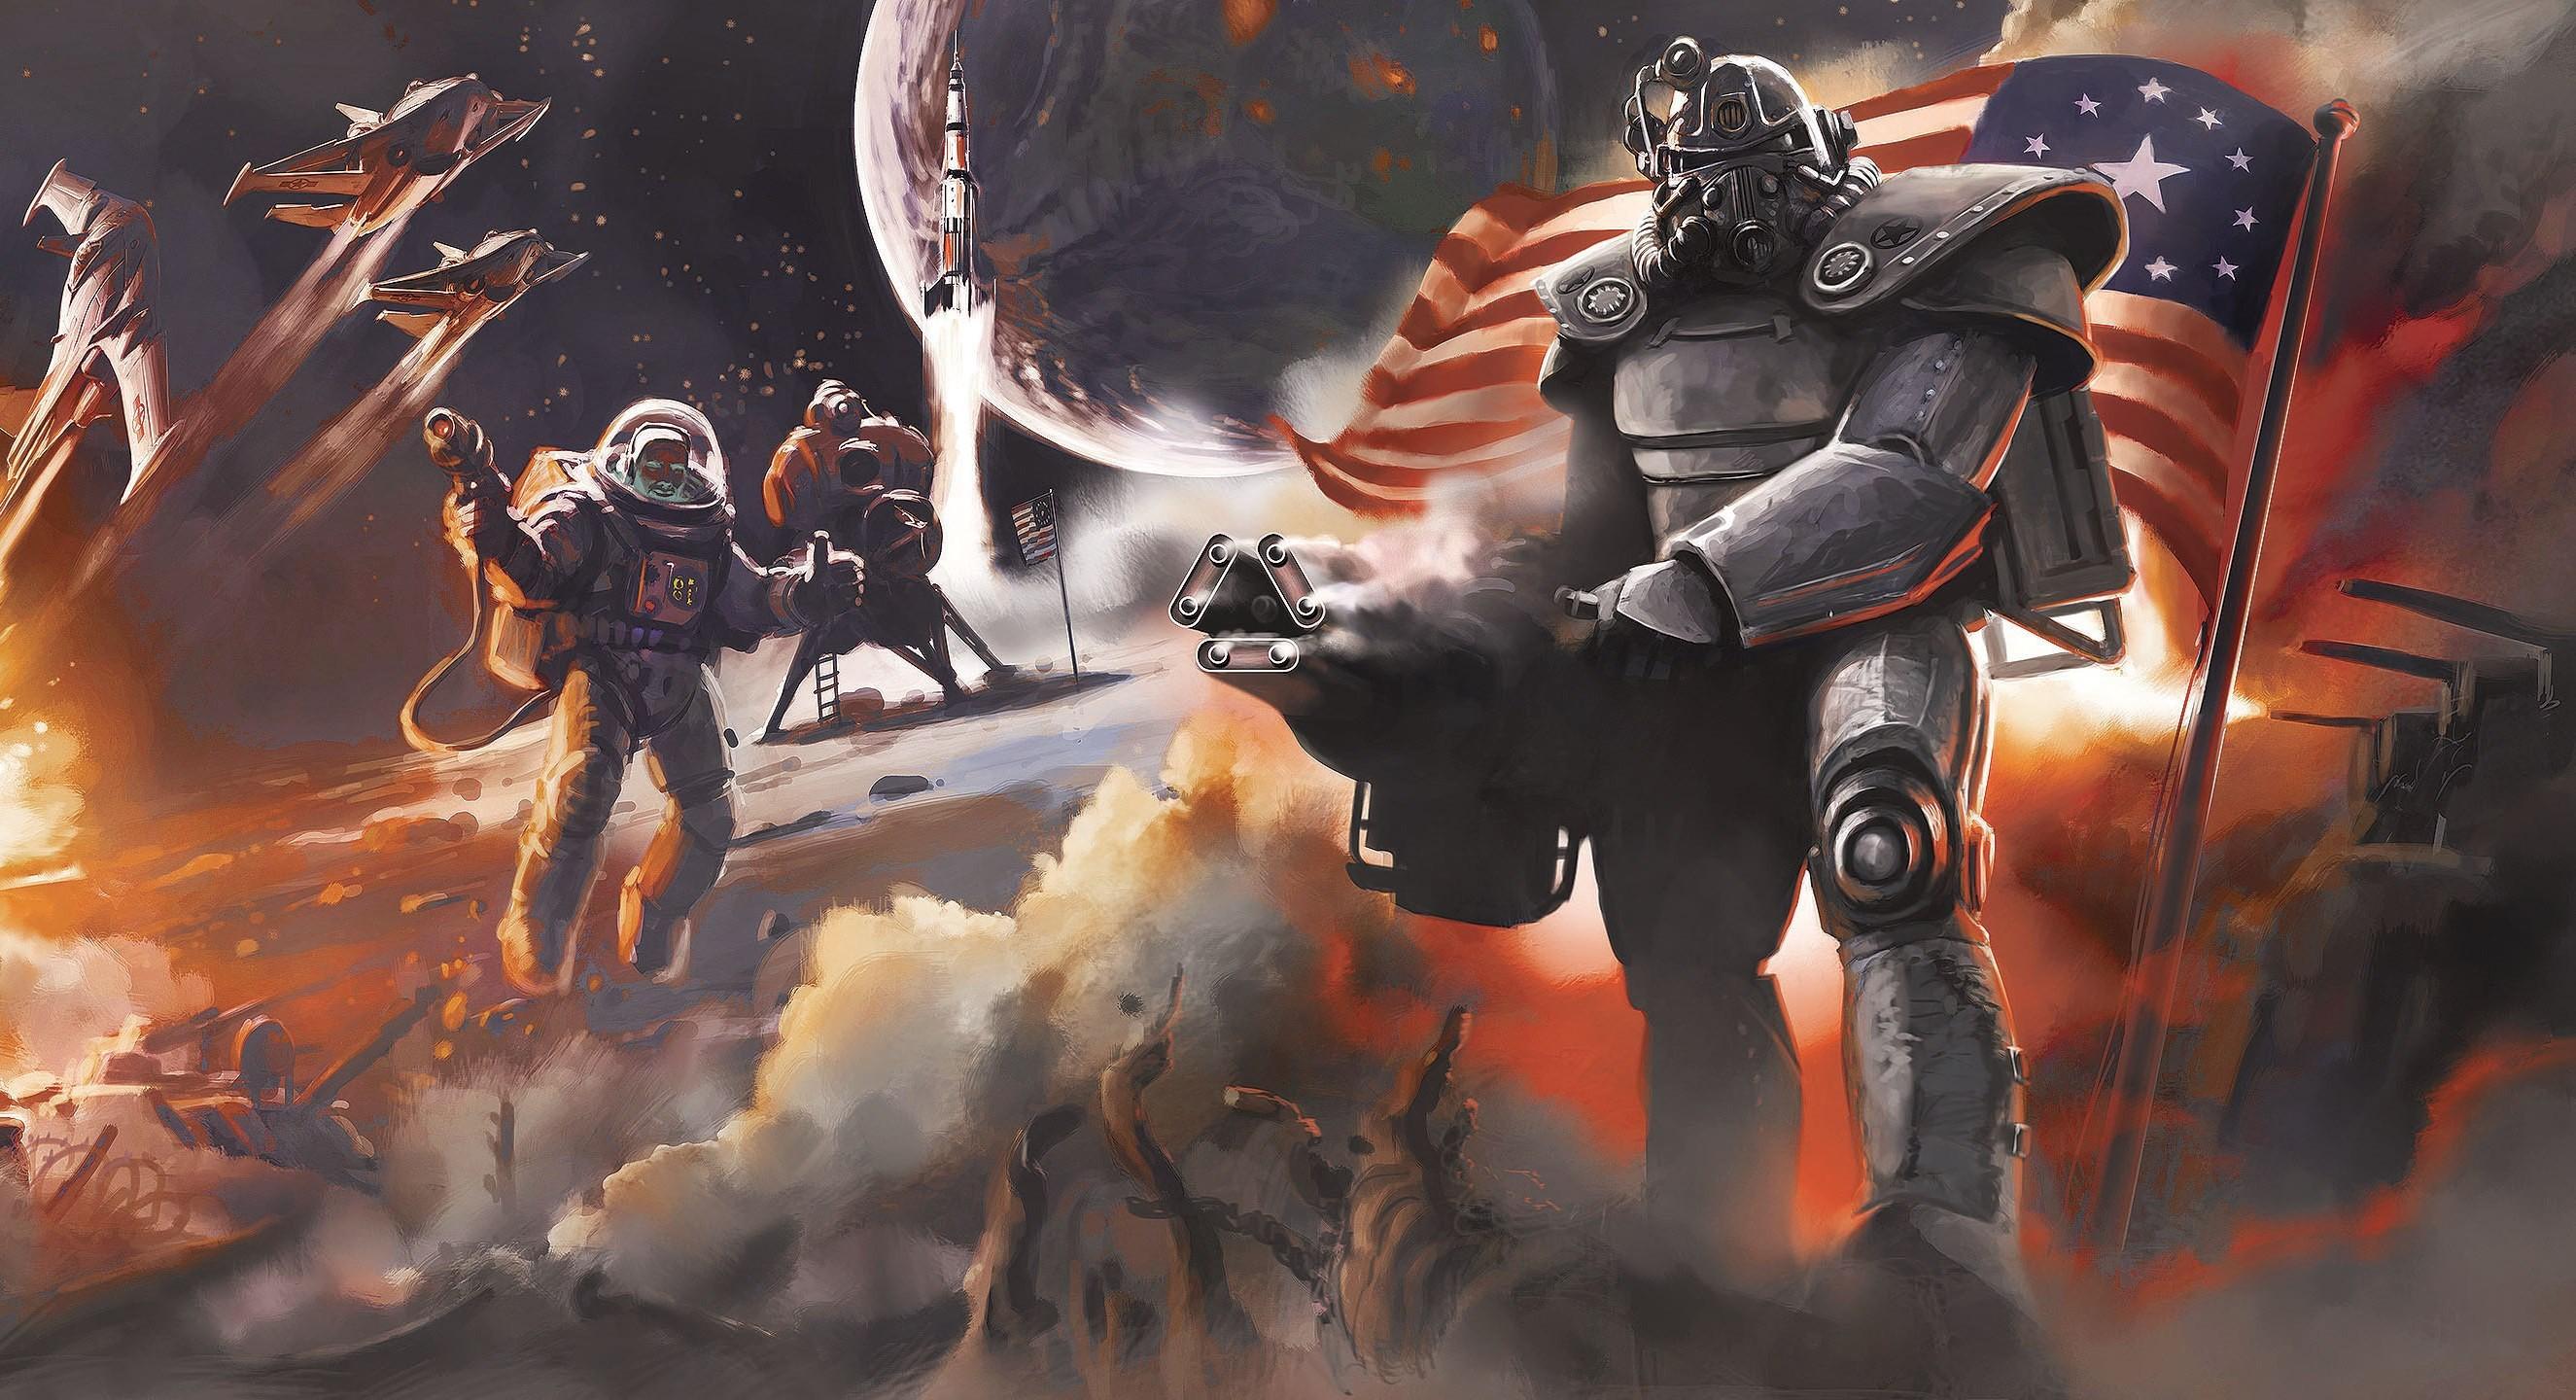 Fallout 4, #concept art, #Fallout, #video games, #Brotherhood